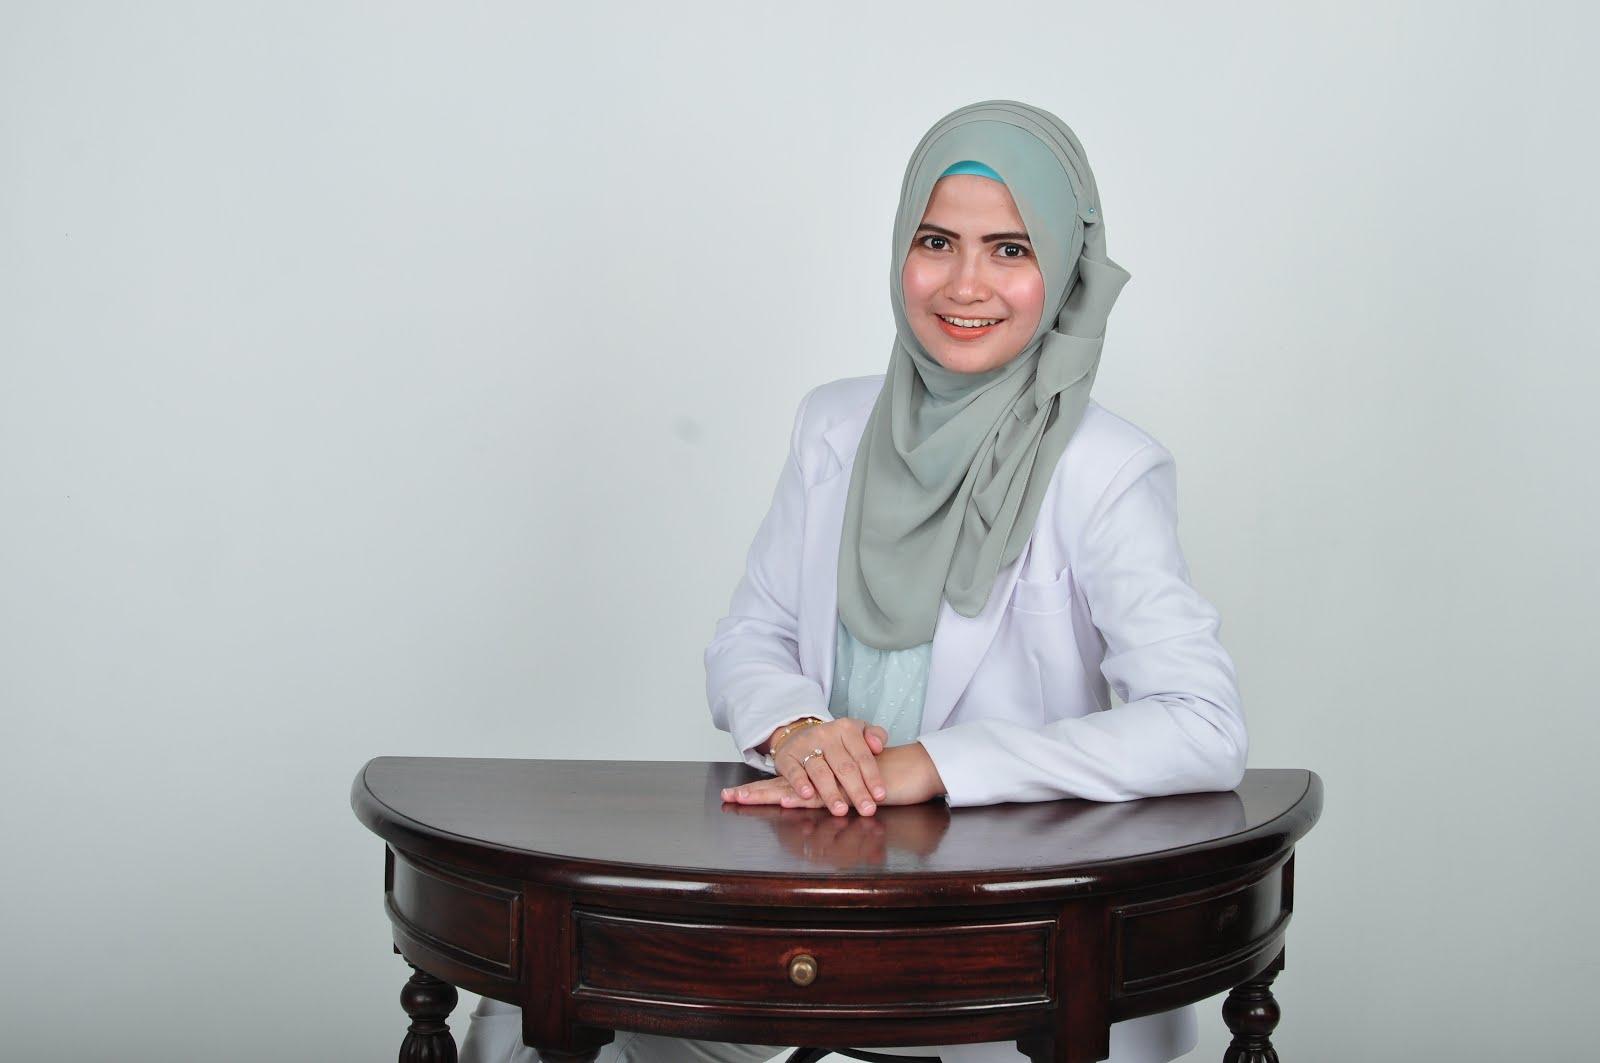 Dr. Uttamy Budianingsih